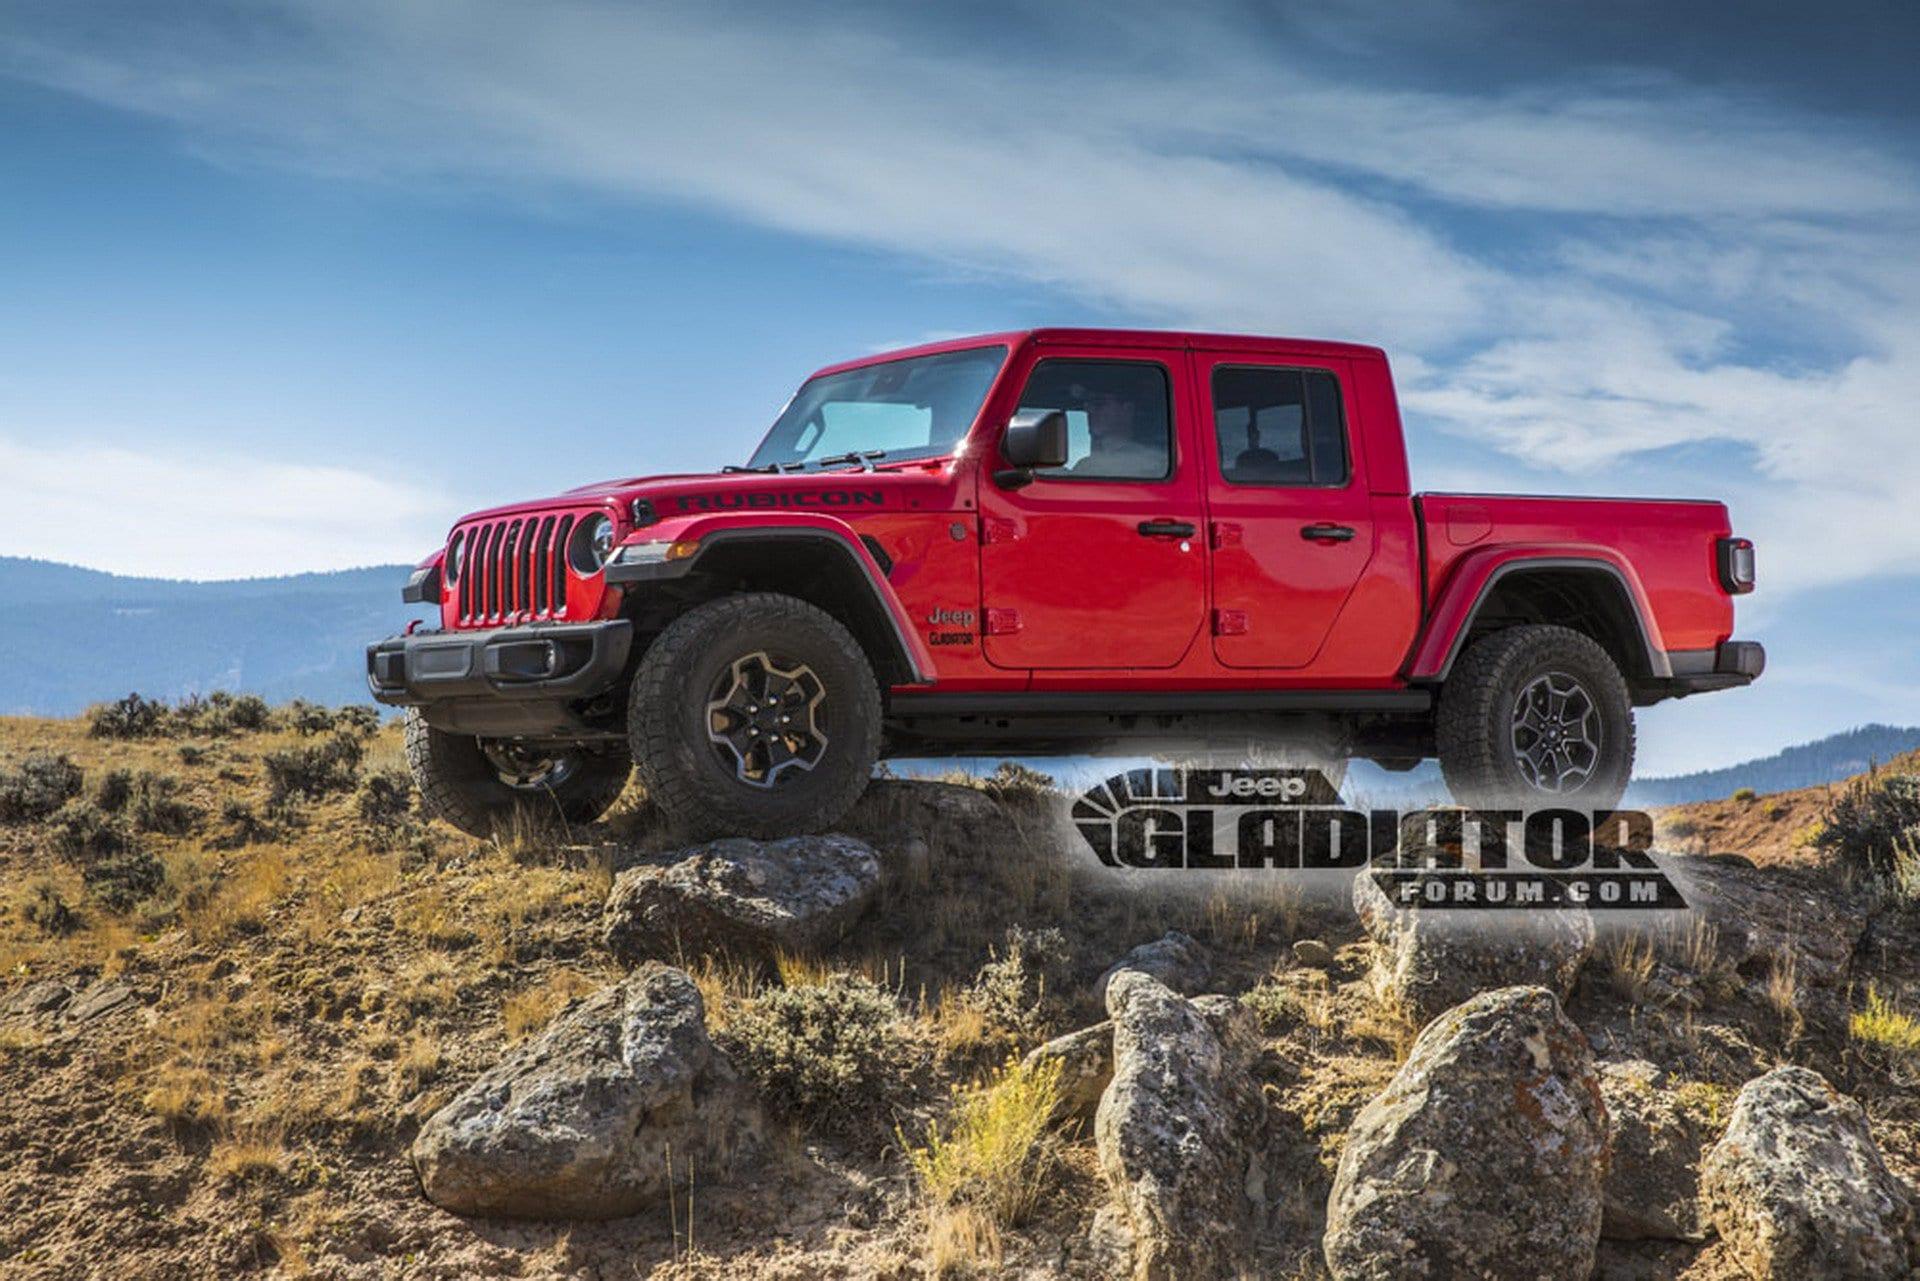 Jeep Gladiator leaked photos